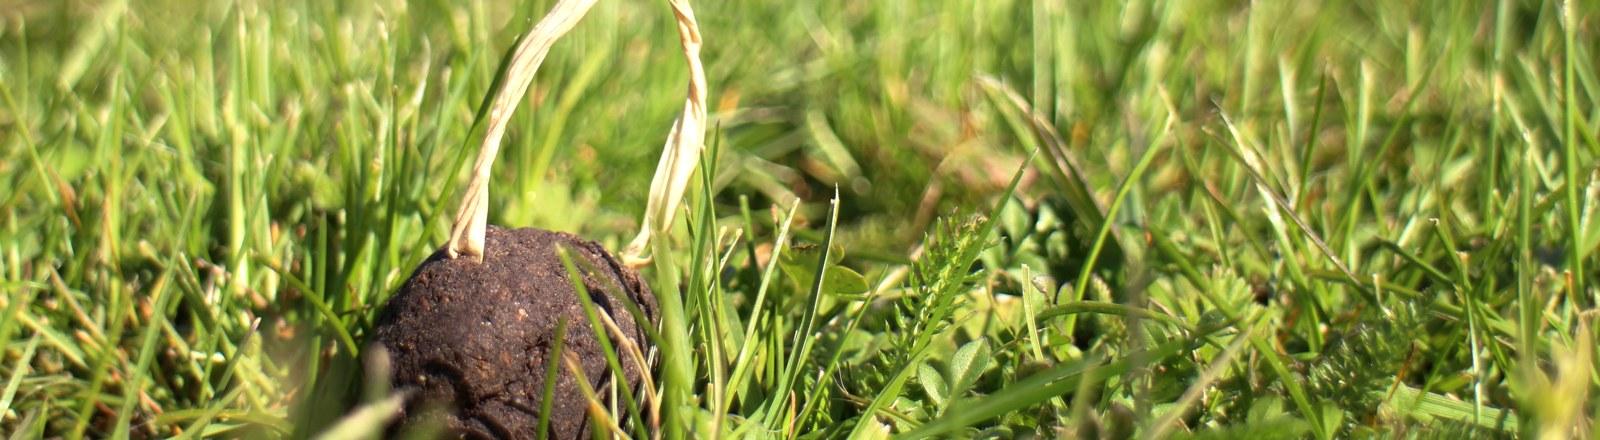 Seedbomb im Gras